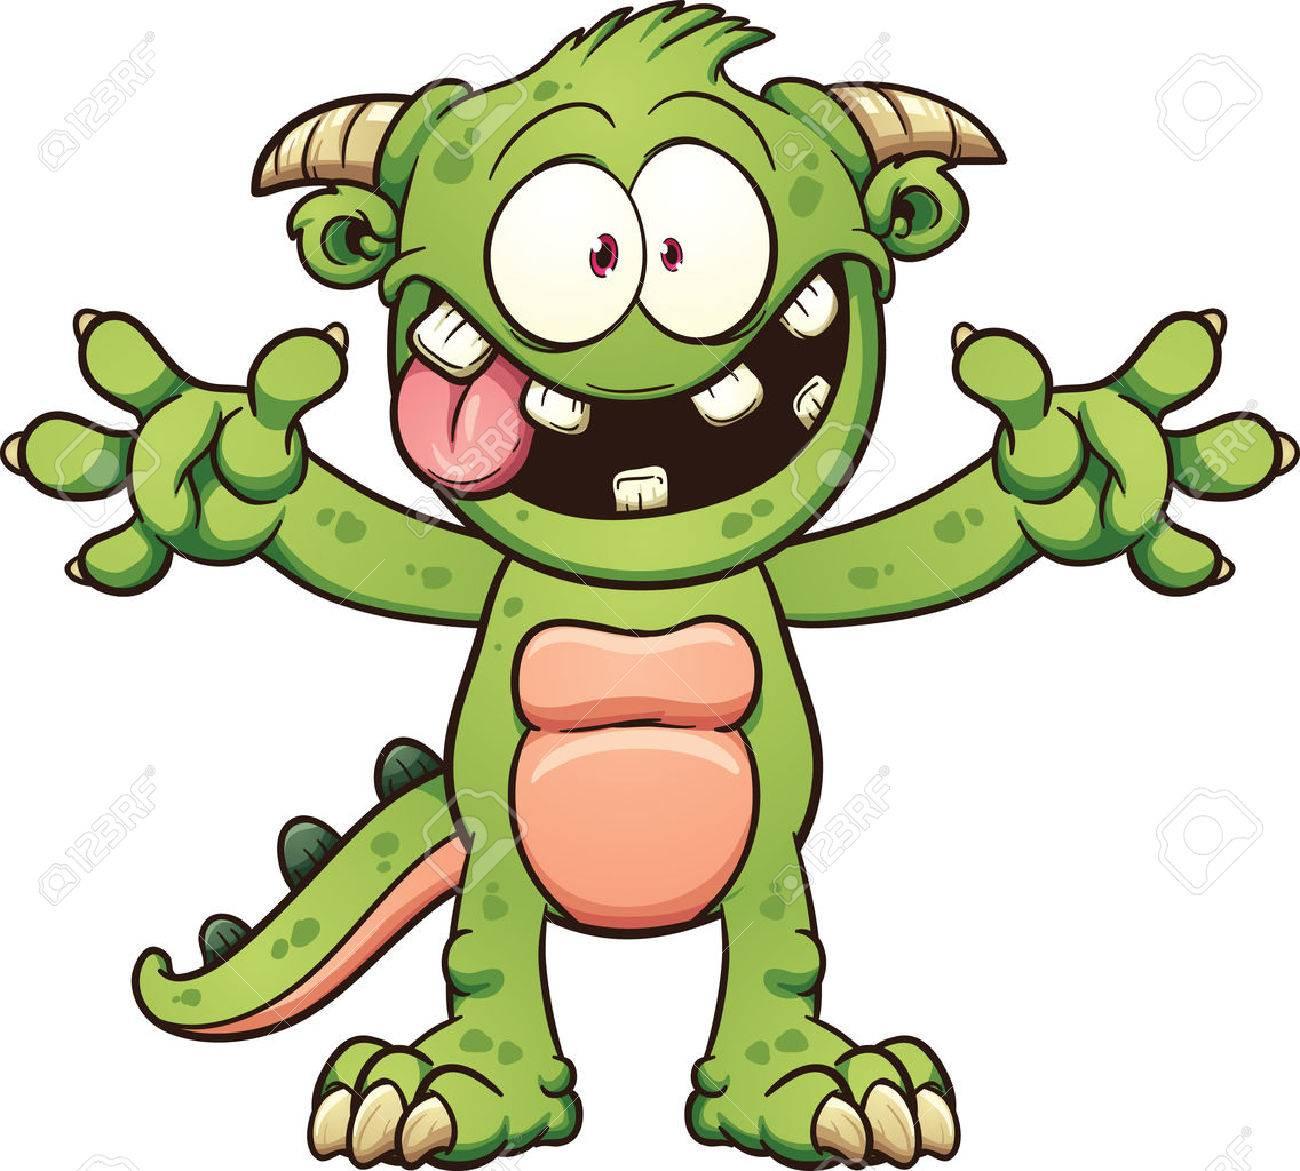 Green cartoon monster. Vector clip art illustration with simple...